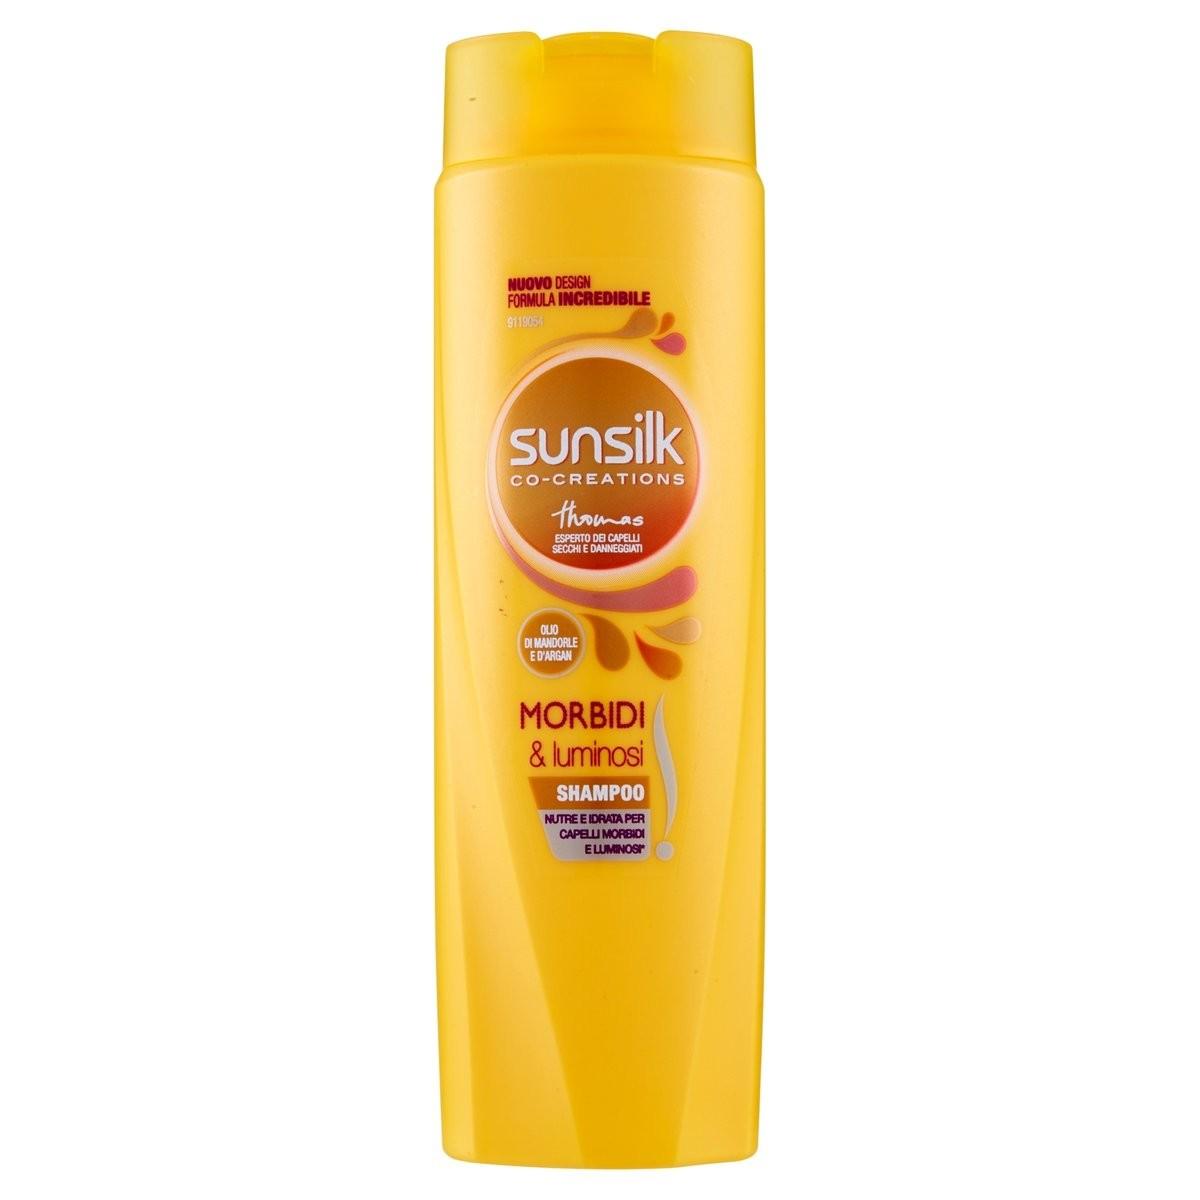 Sunsilk Shampoo Morbidi & Luminosi